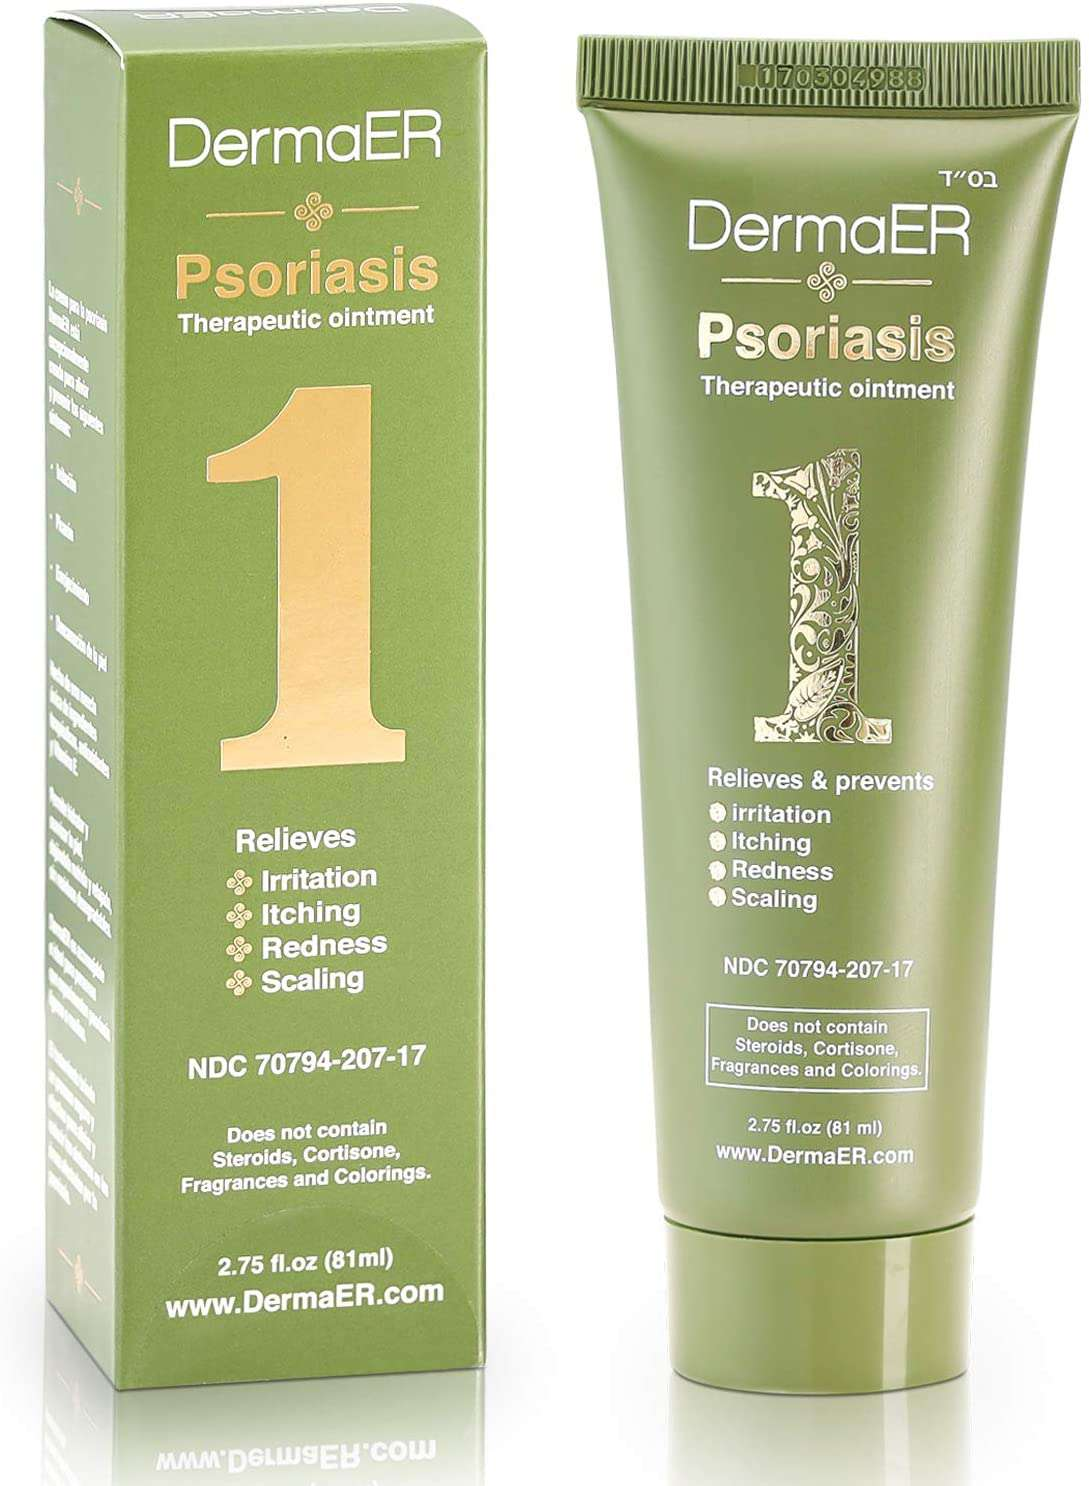 DermaER Psoriasis Medicated Cream